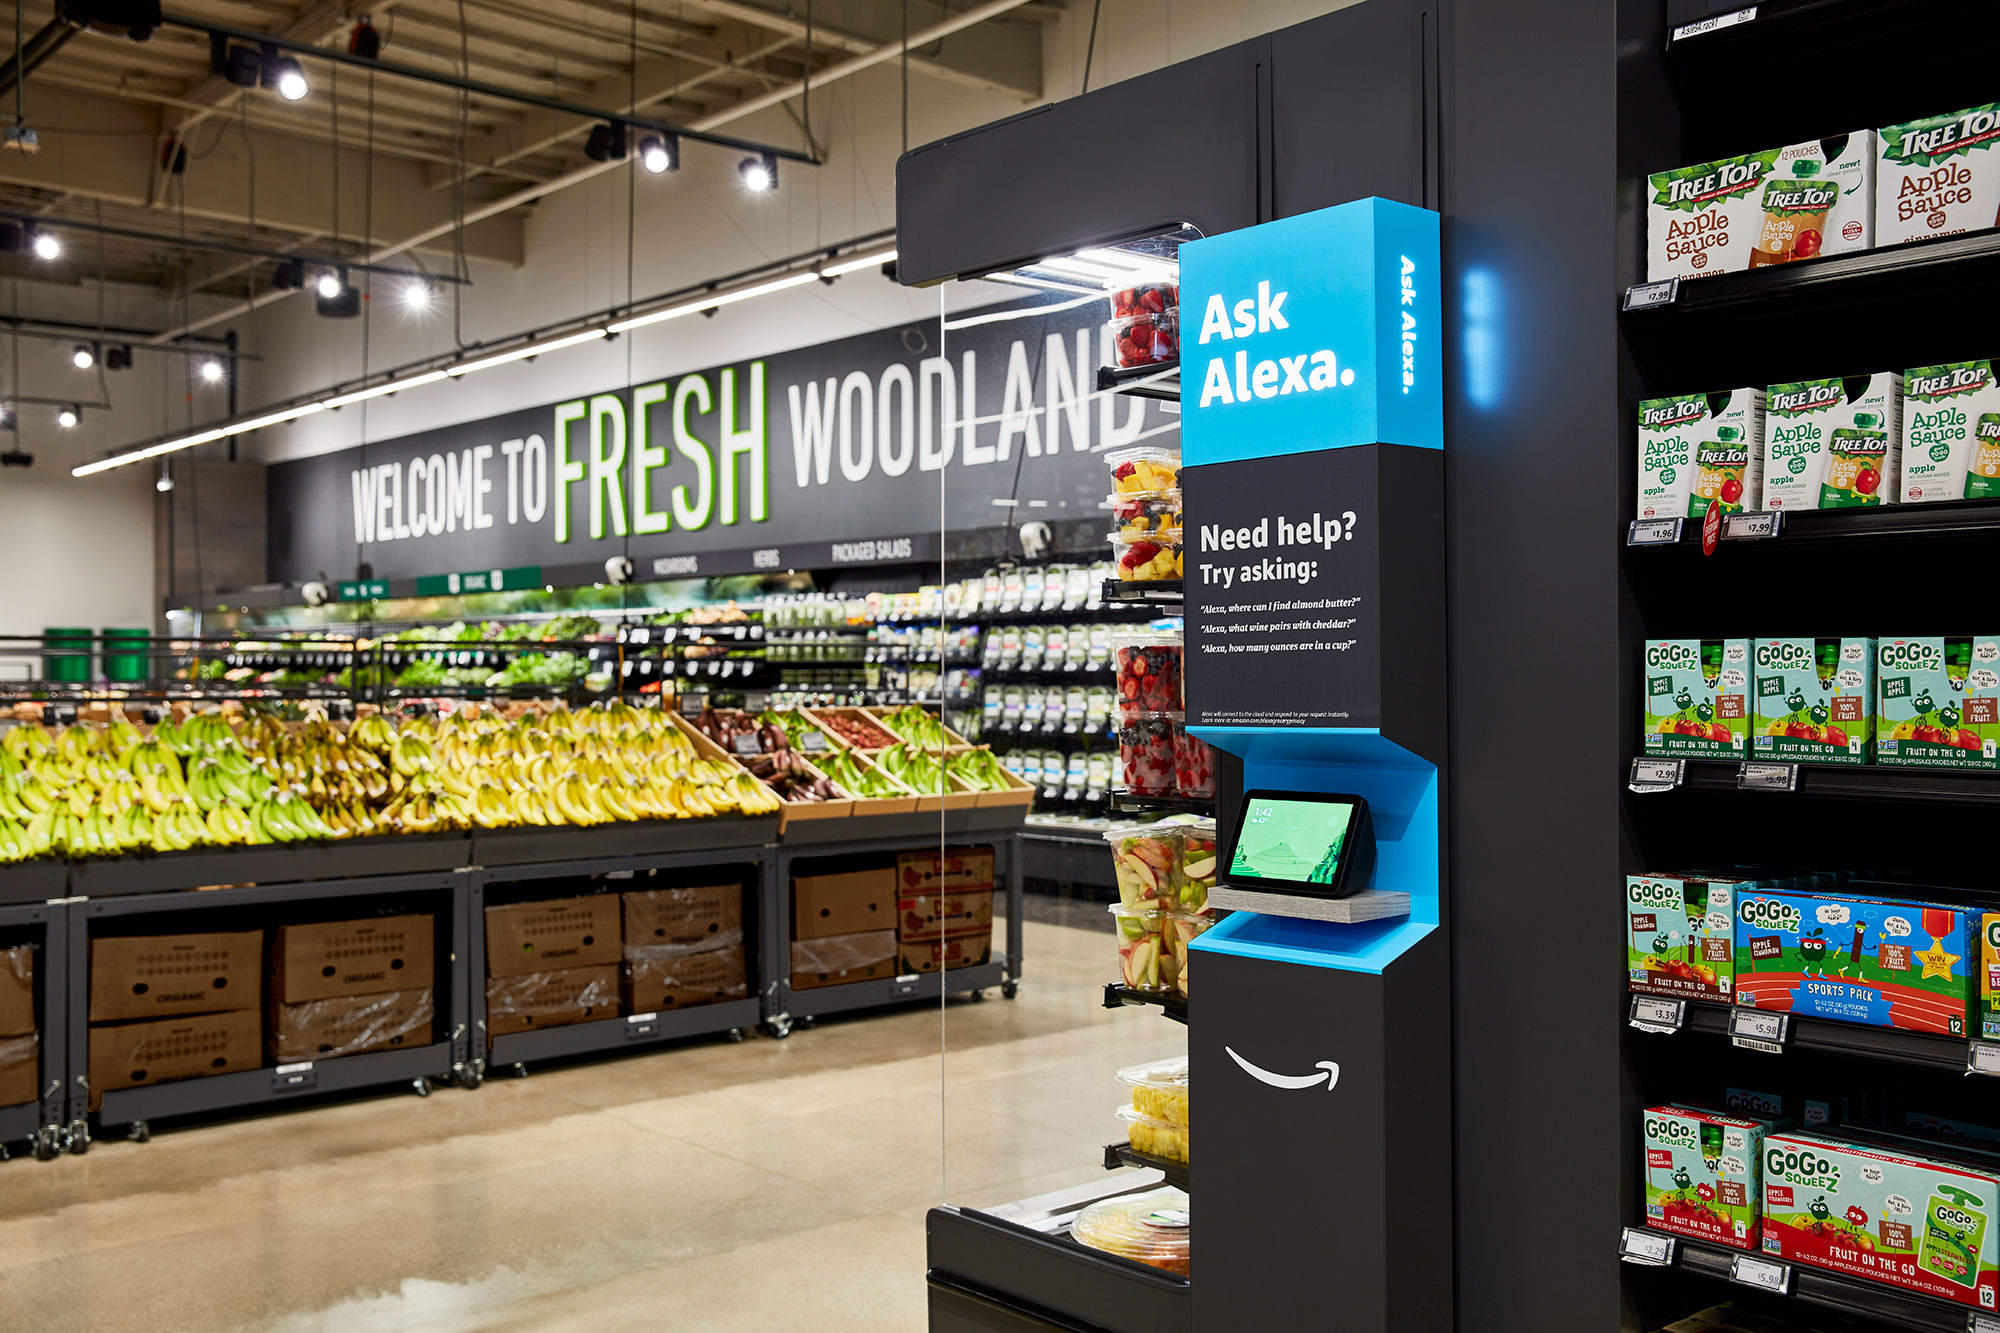 Amazon Fresh Opens in Irvine. Image ©Amazon